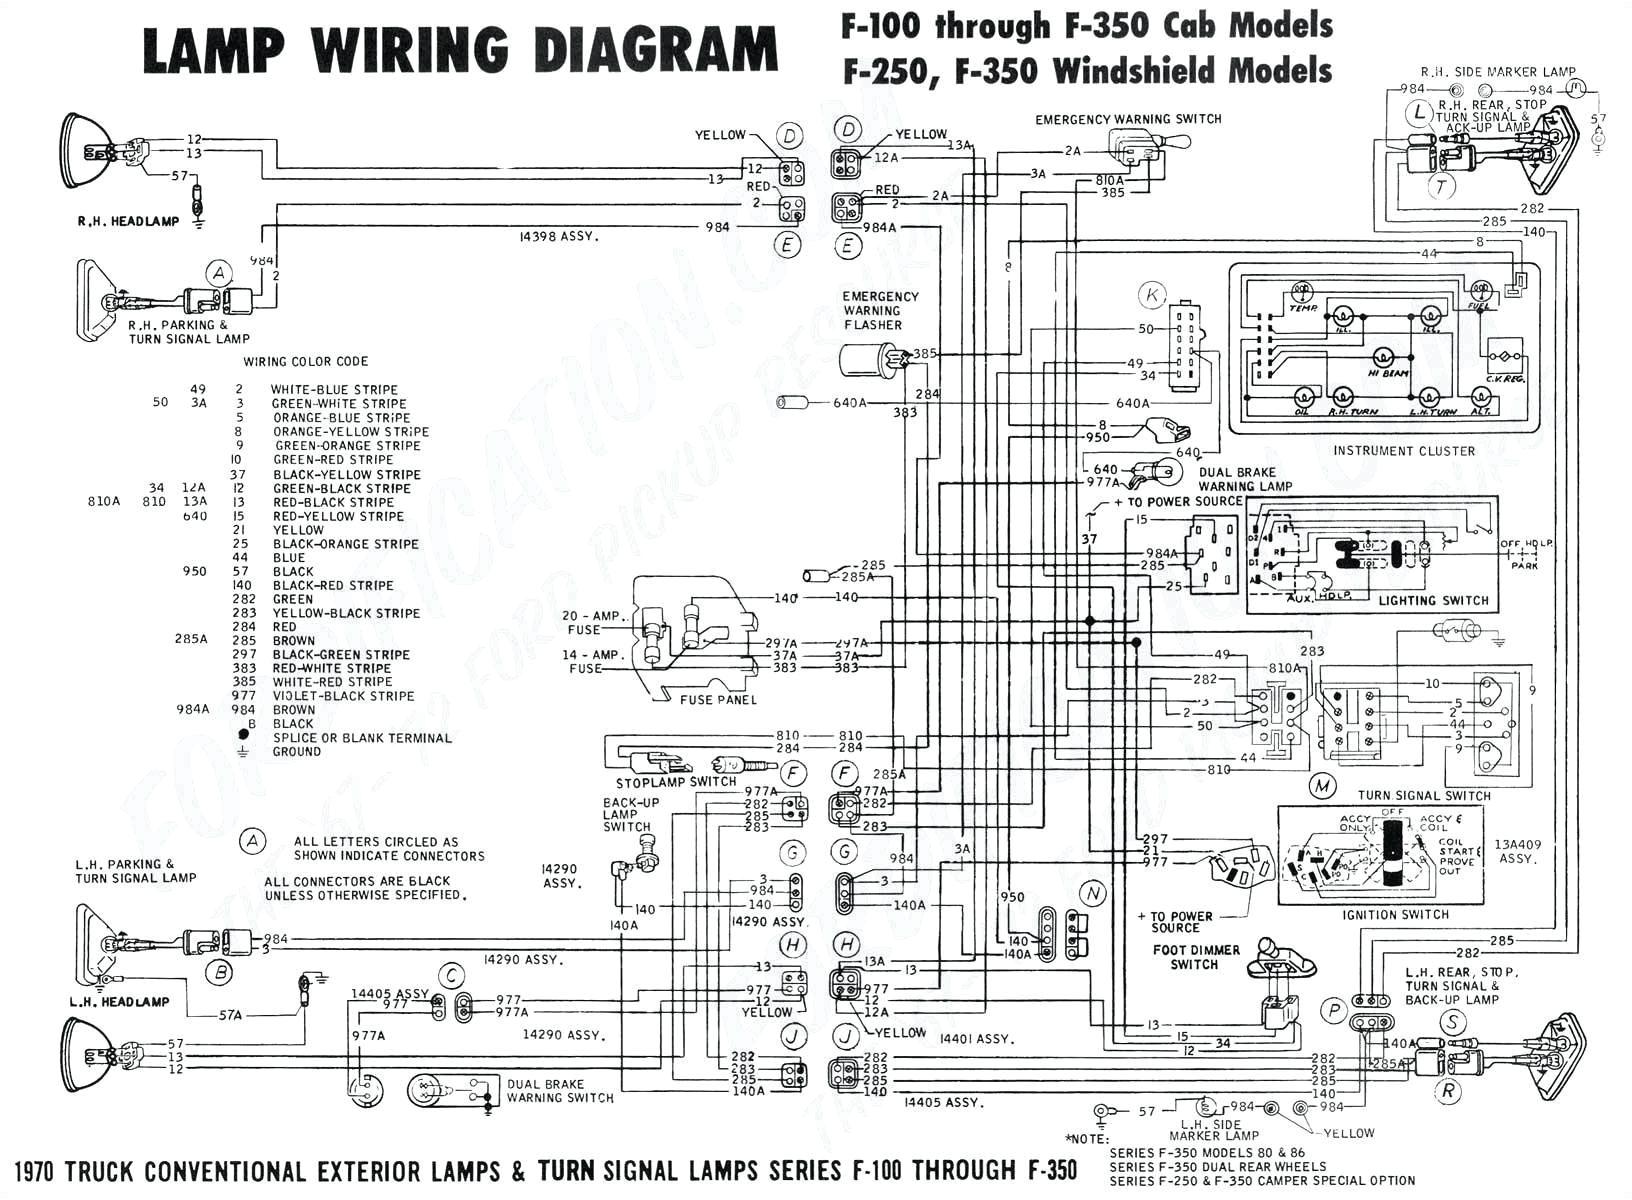 toyota 5k wiring diagram wiring diagram repair guides 2013 toyota corolla wiring diagram wiring diagram databasetoyota